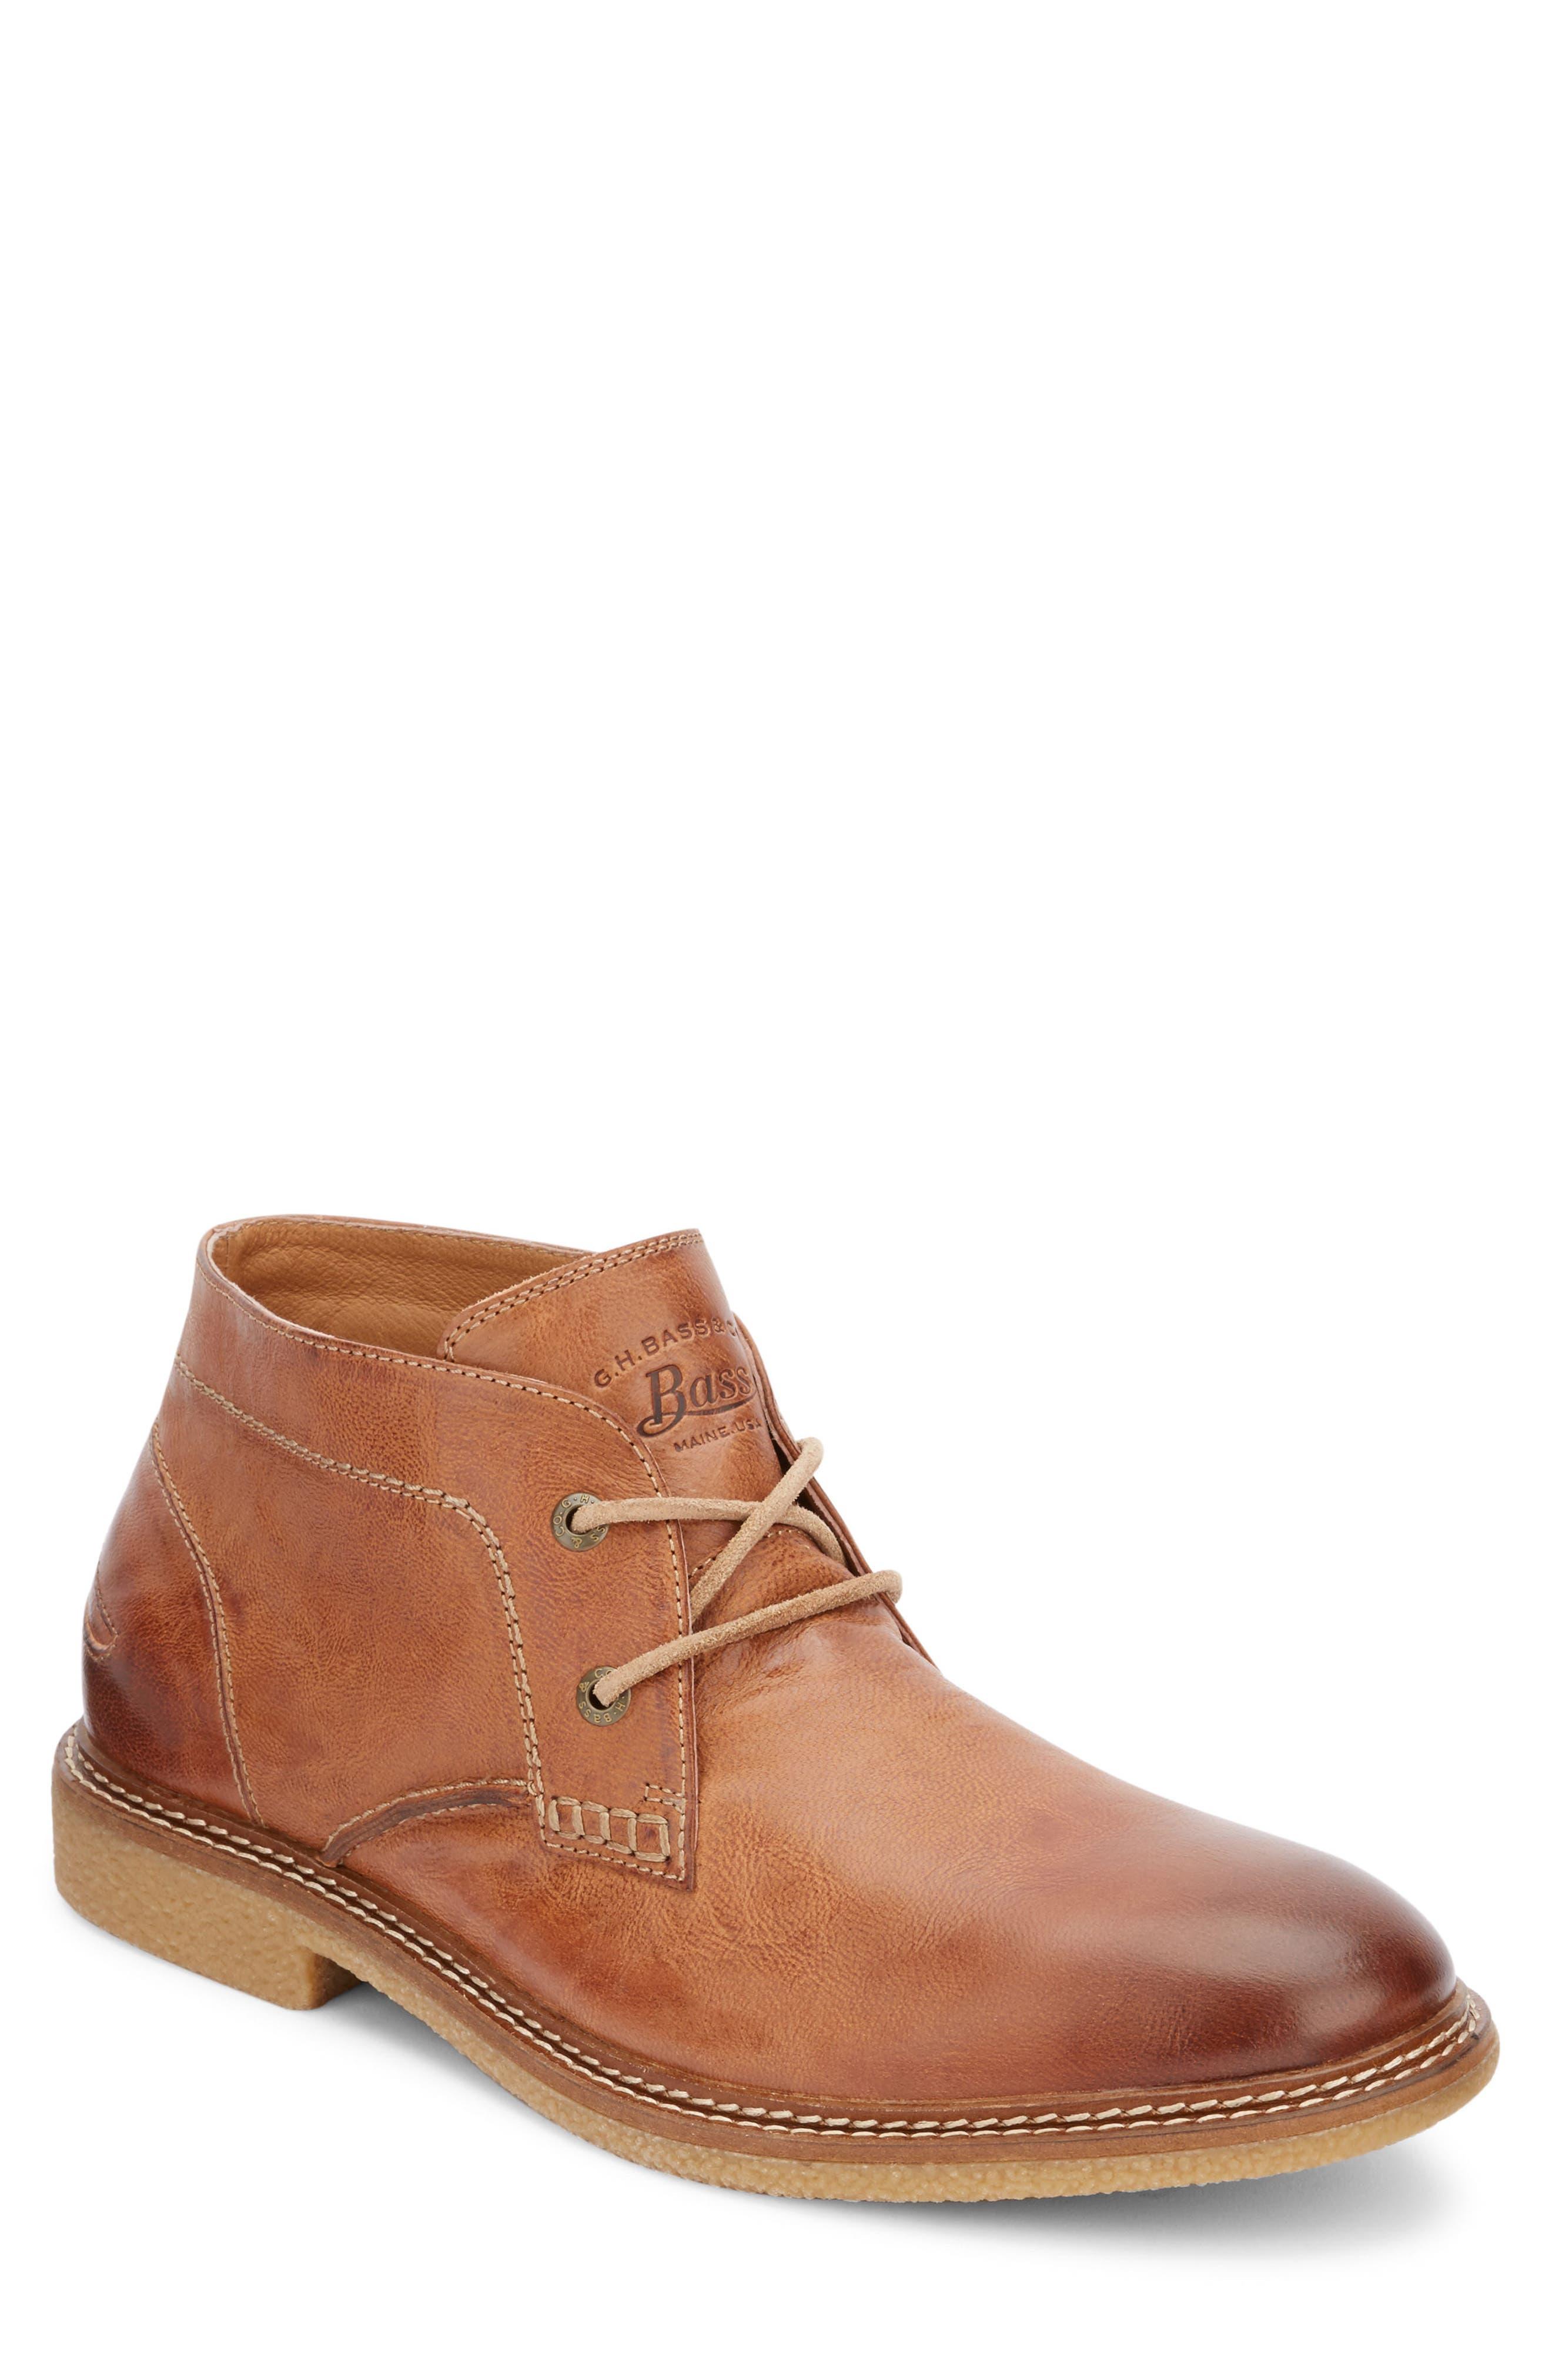 'Bennett' Chukka Boot,                             Main thumbnail 1, color,                             Tan Leather